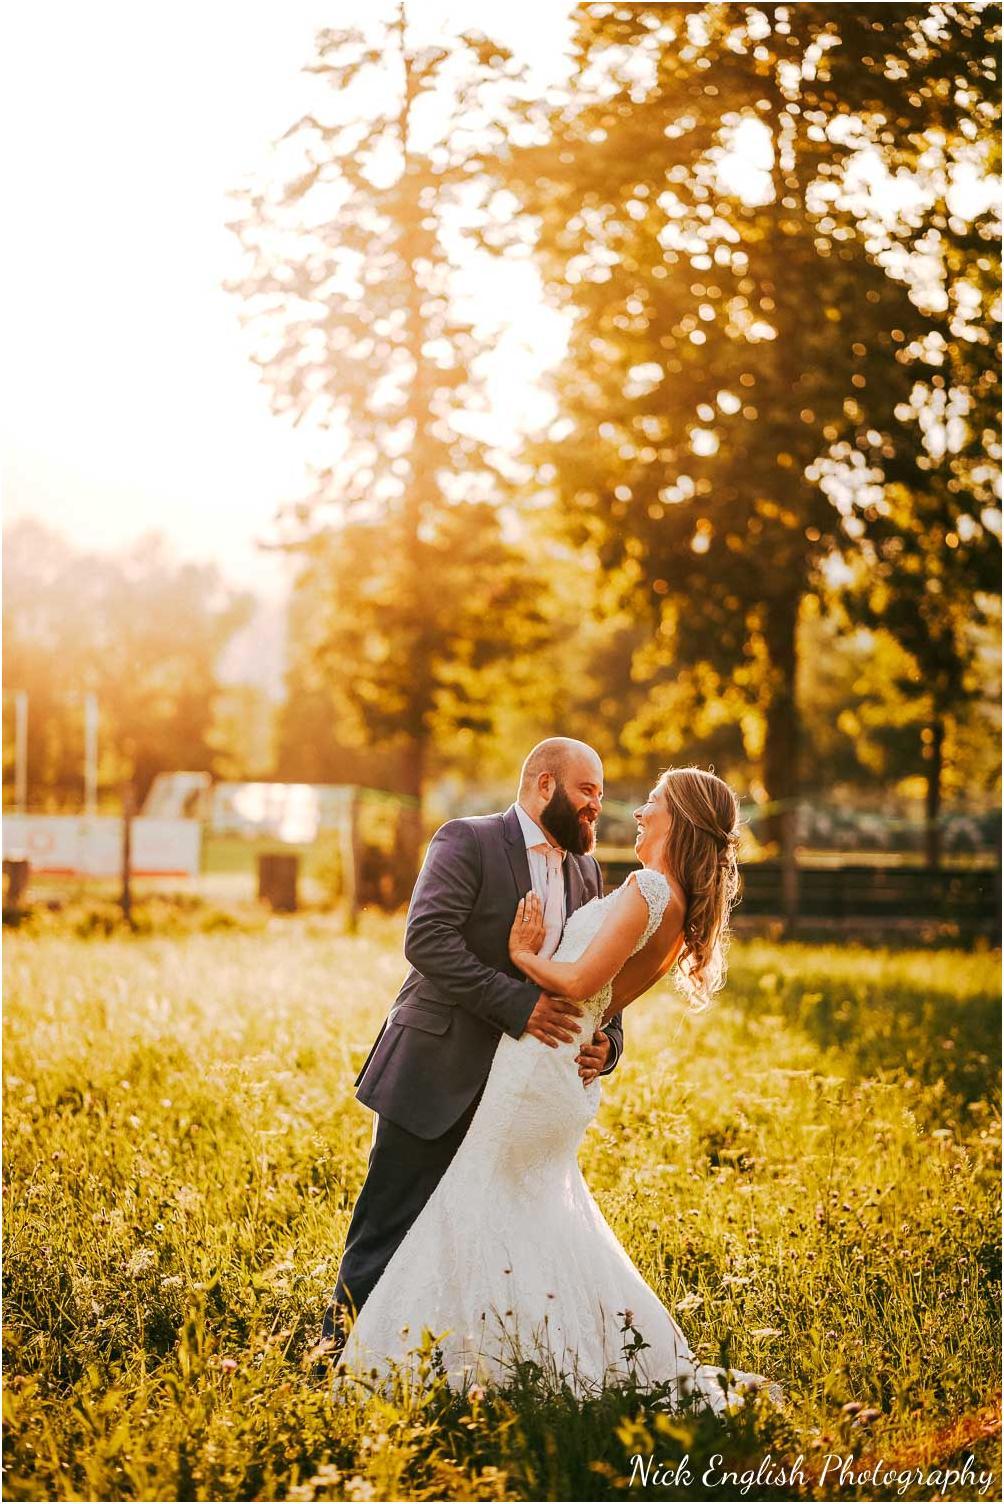 Lake_Bled_Destination_Wedding_Photographs-8.jpg